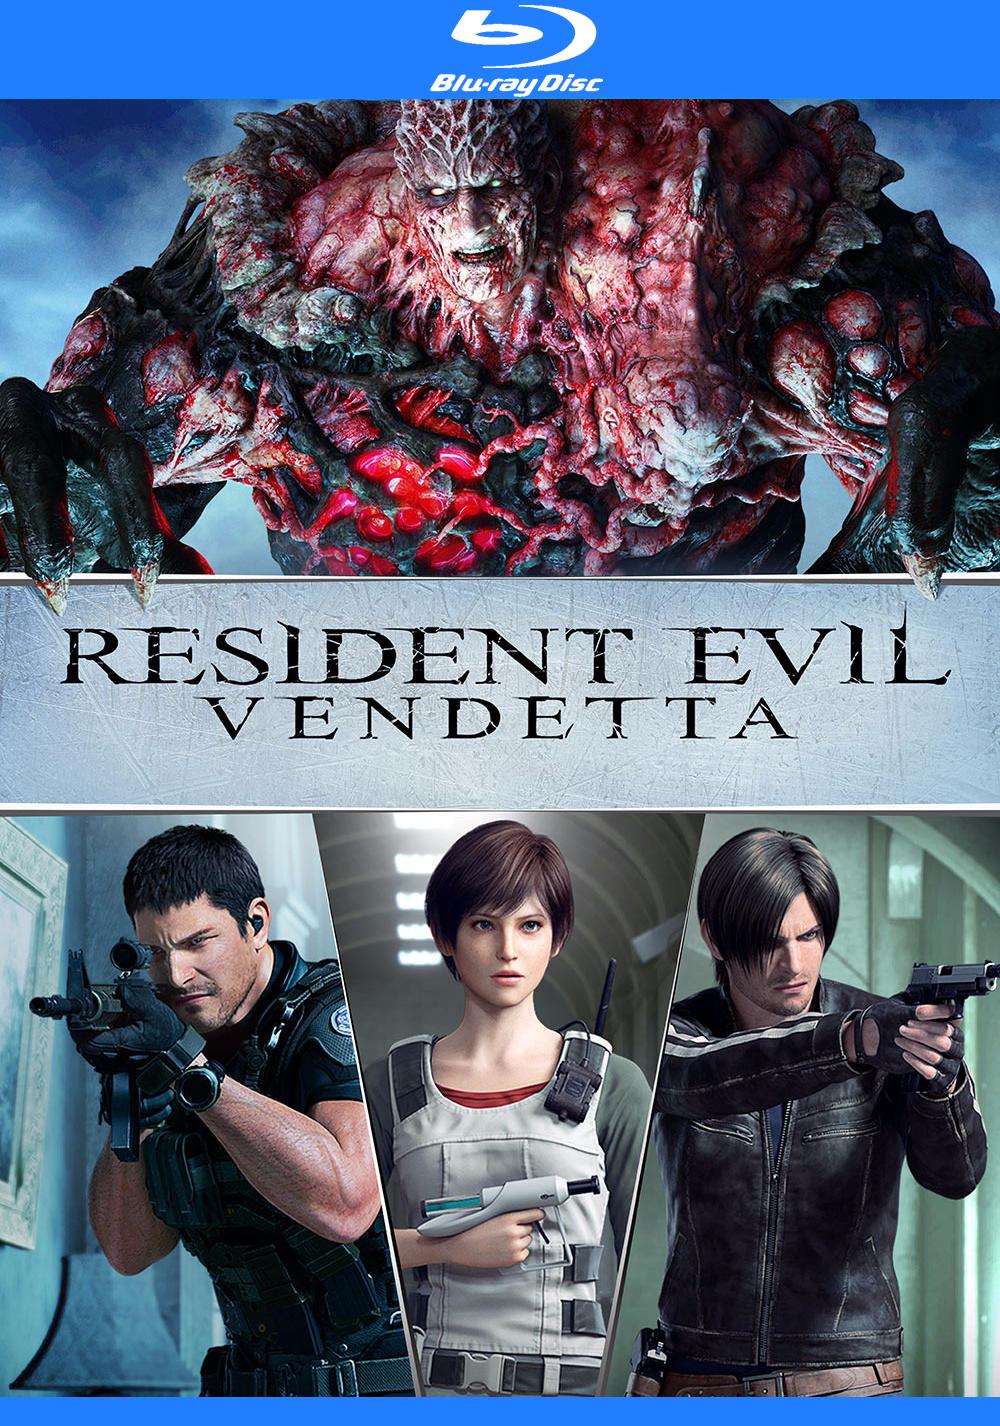 Download Resident Evil A Vingança (2017) - Legendado MP4 720p BDRip MEGA